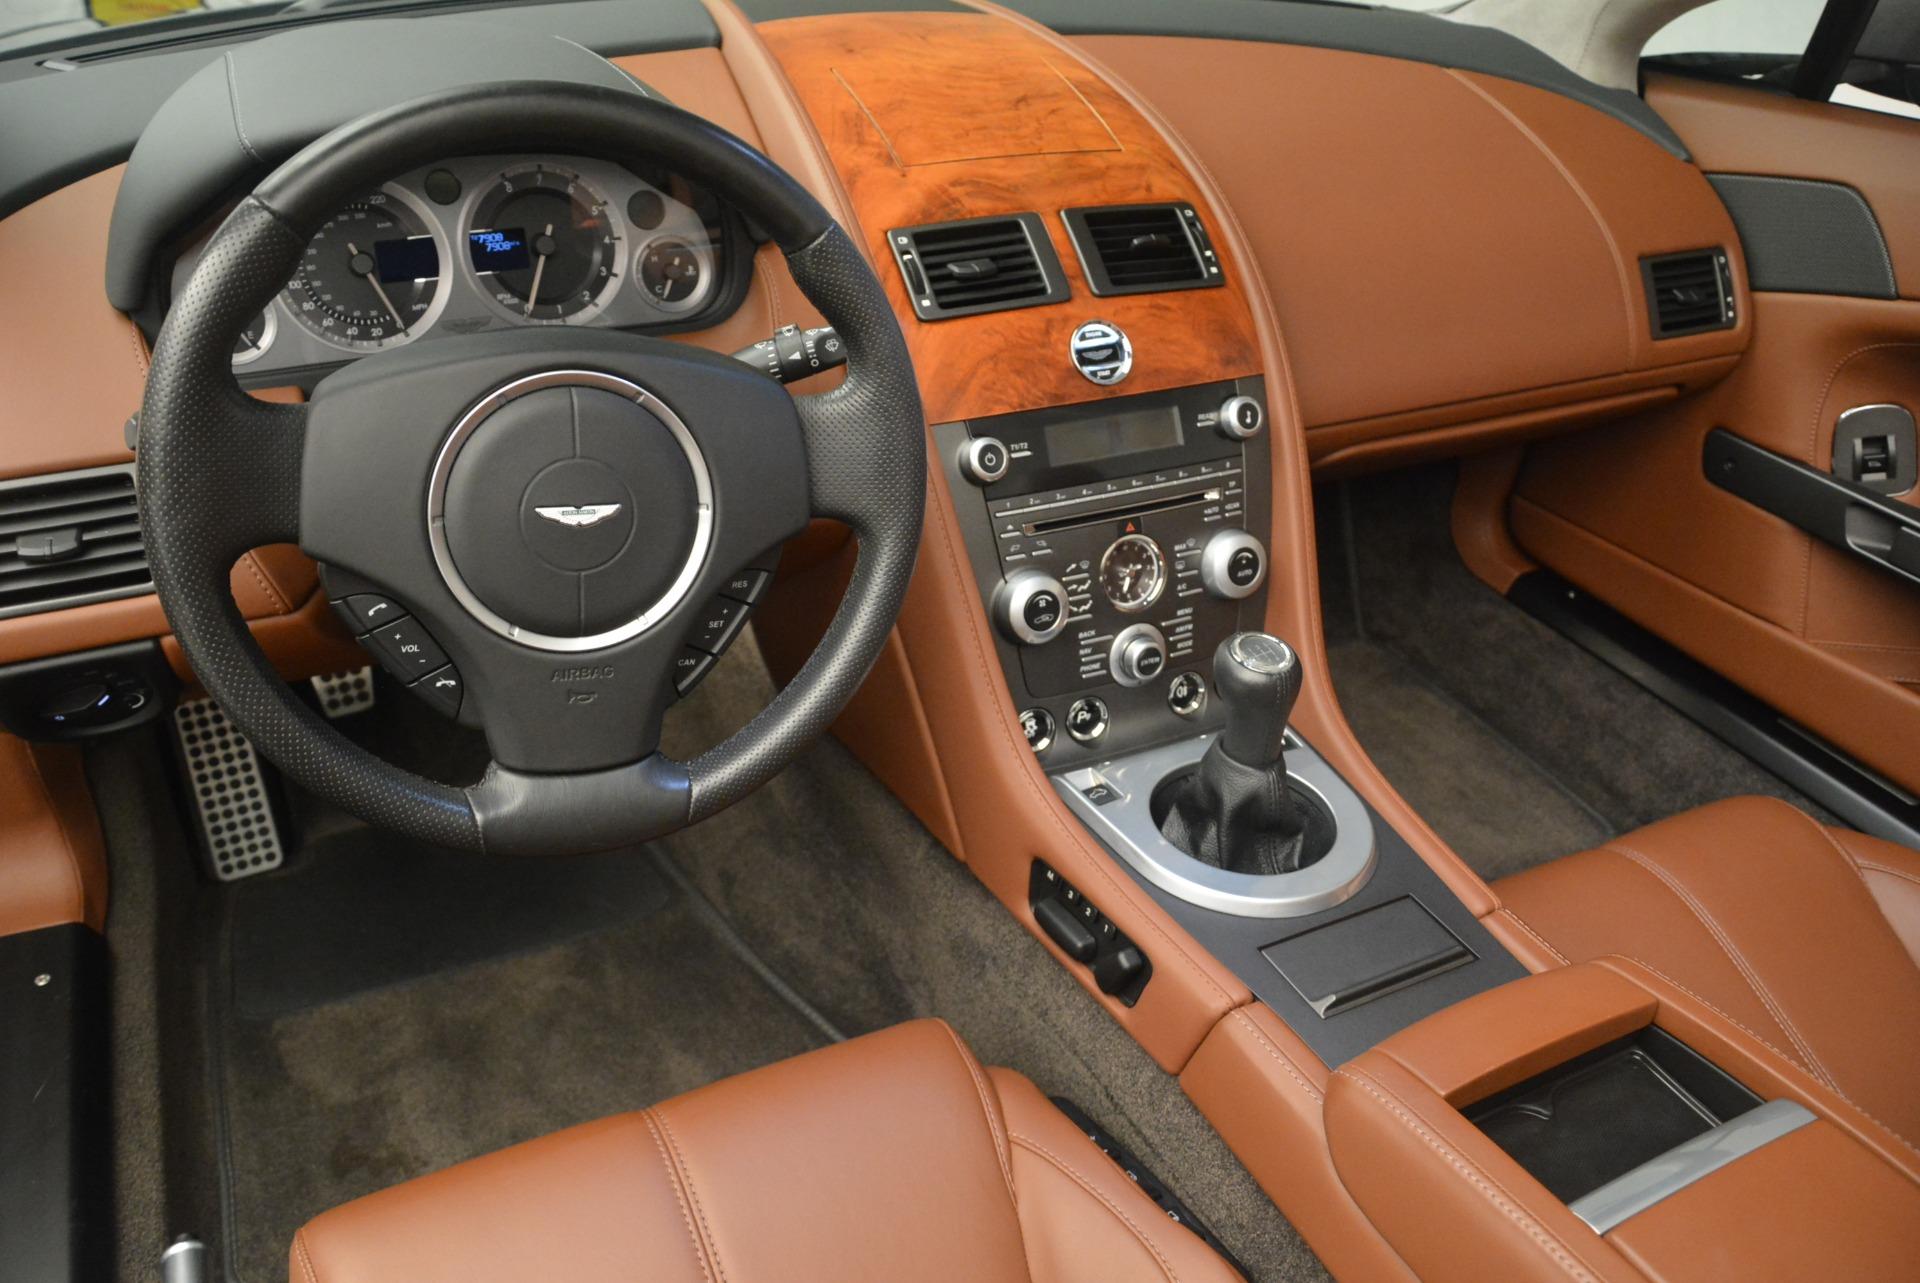 Used 2015 Aston Martin V8 Vantage Roadster For Sale In Westport, CT 2463_p20